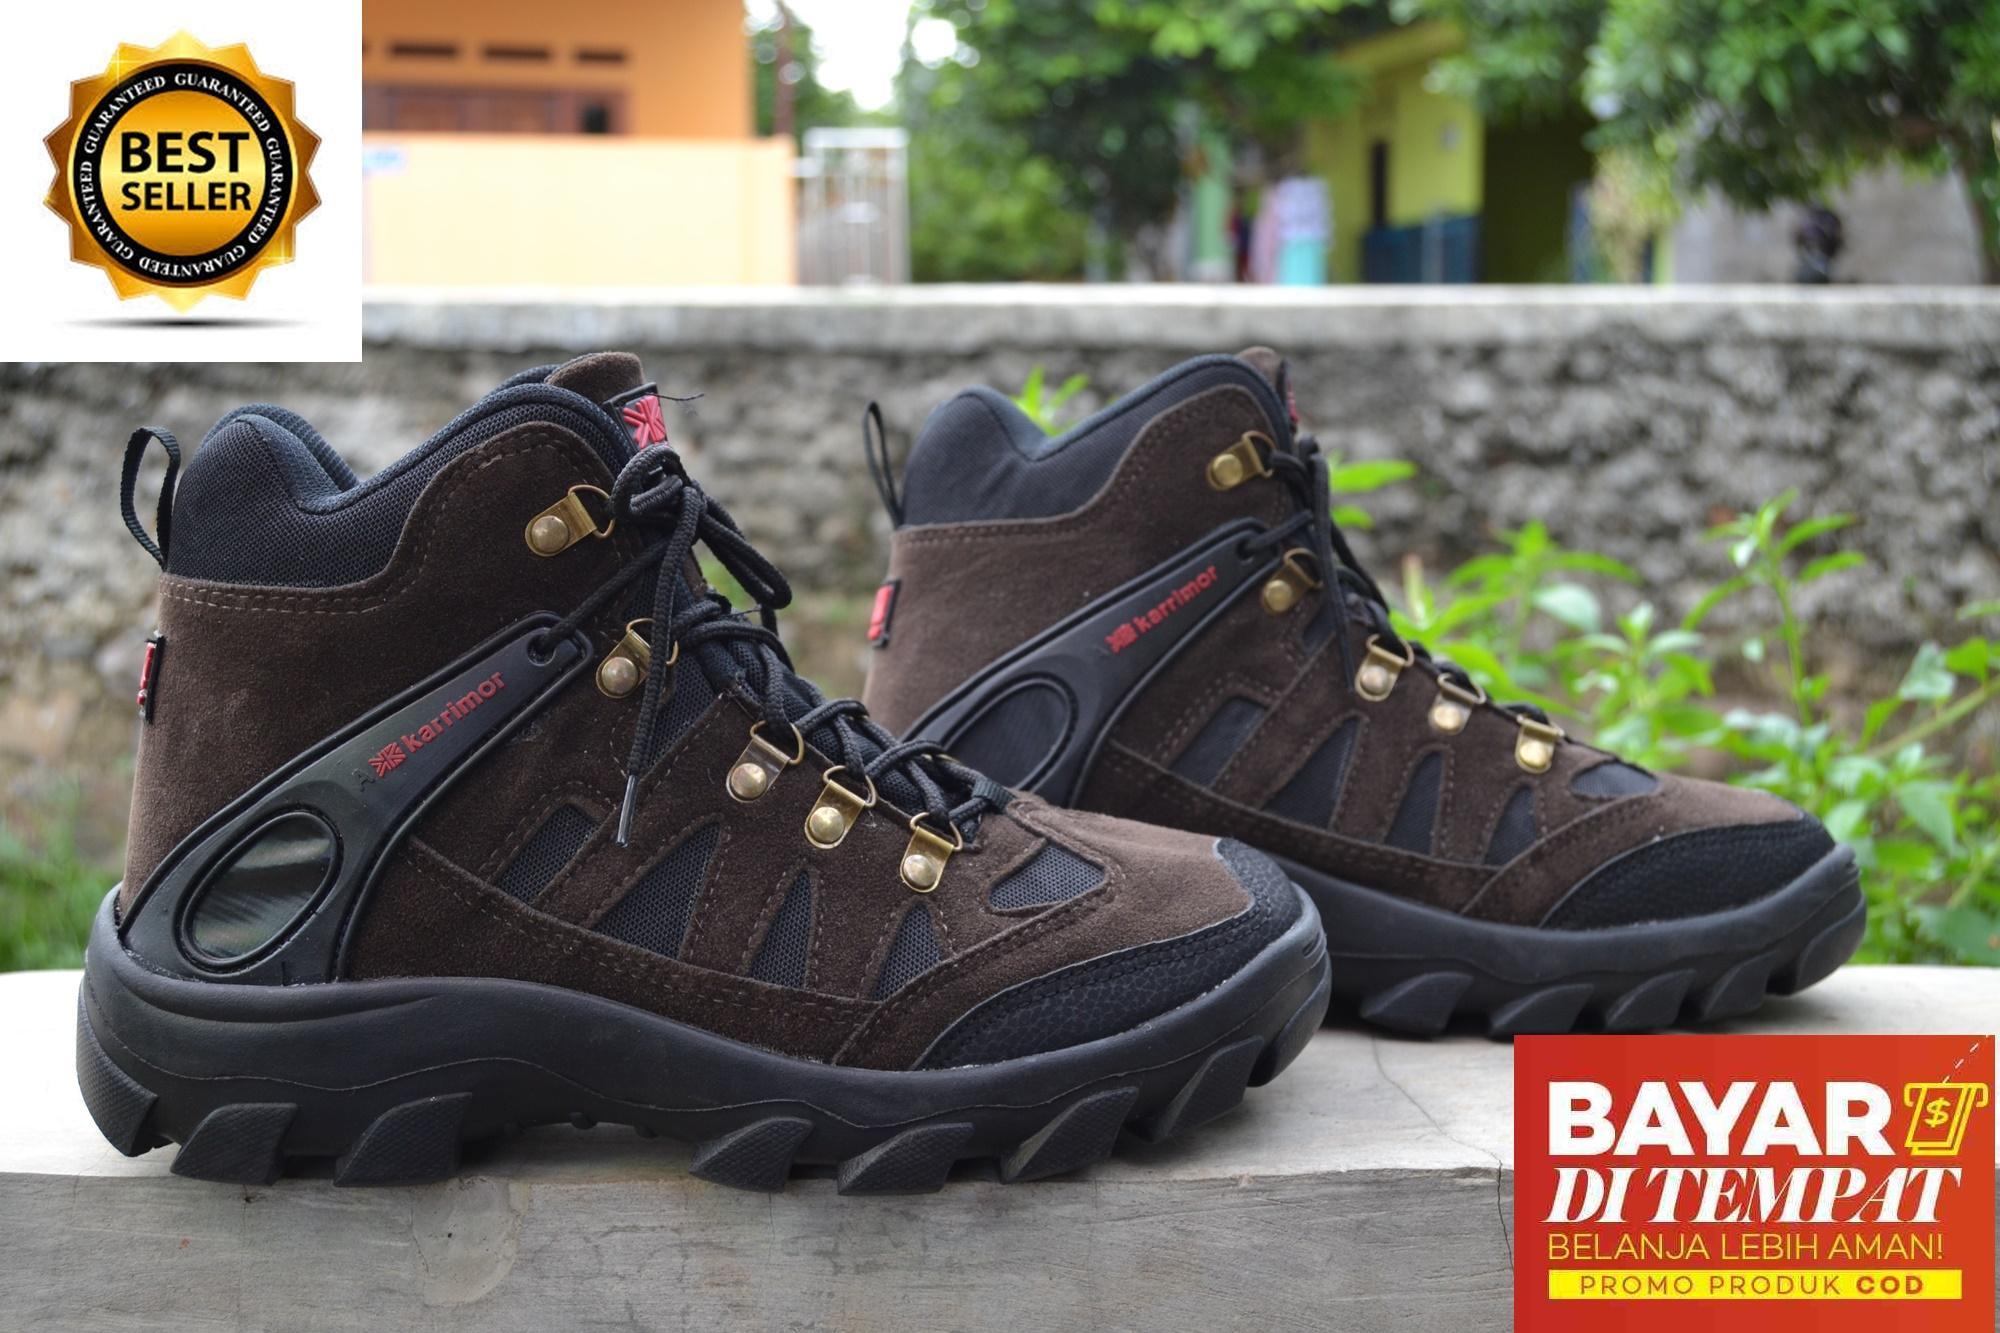 Sepatu Gunung Karrimor High Sepatu Outdoor Pria 26c6bc73ea